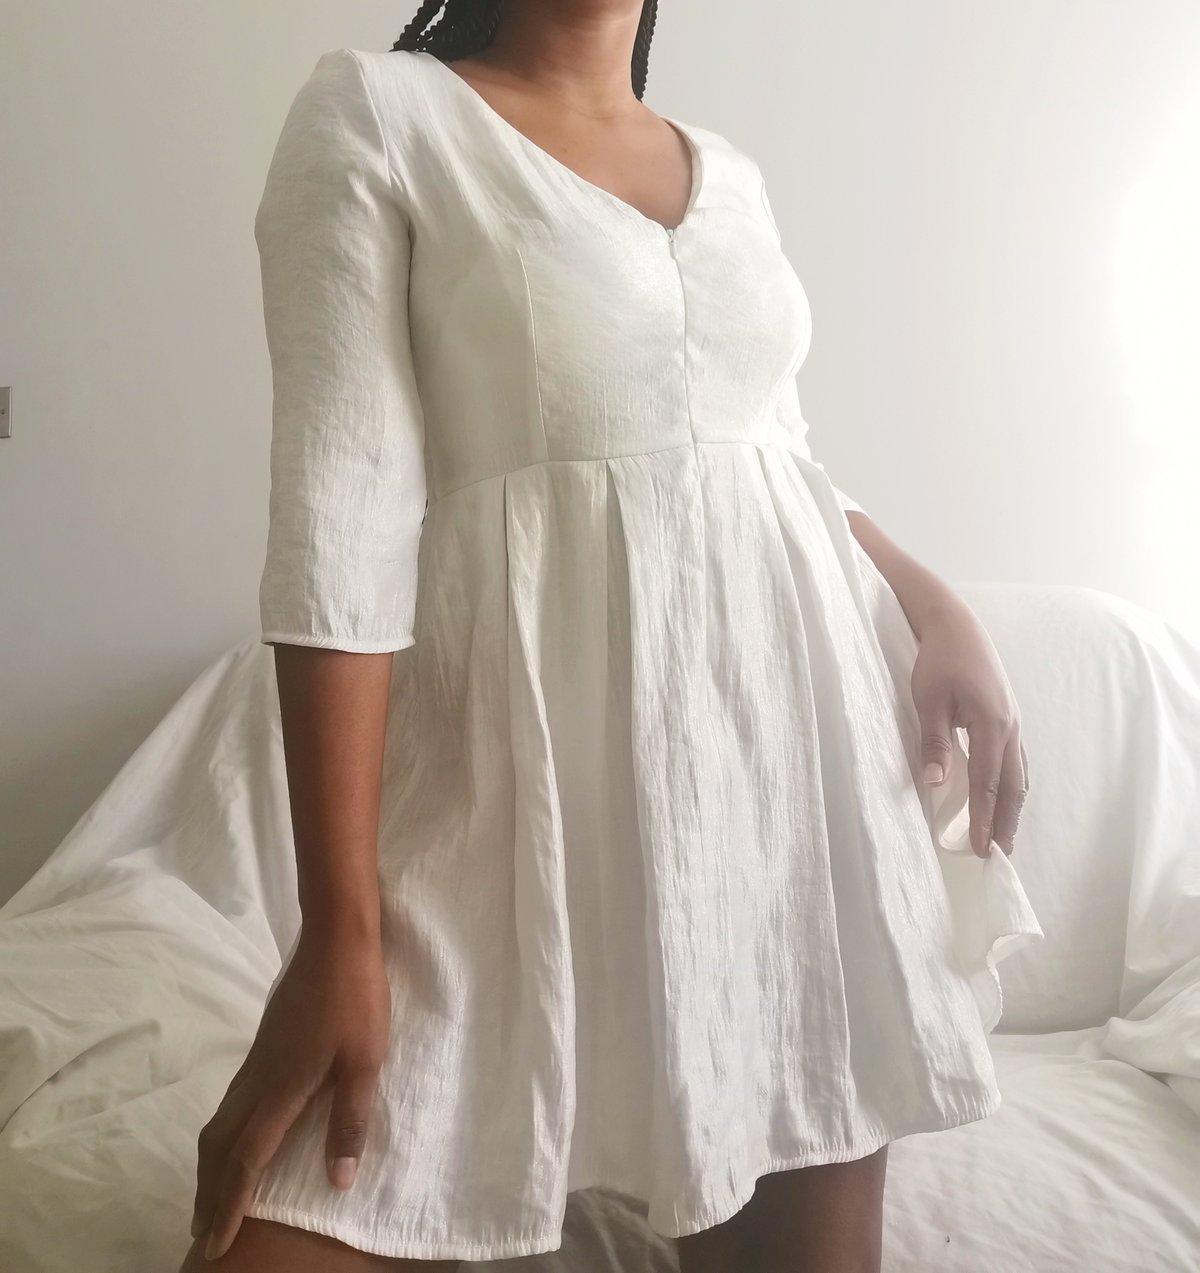 Image of white dress